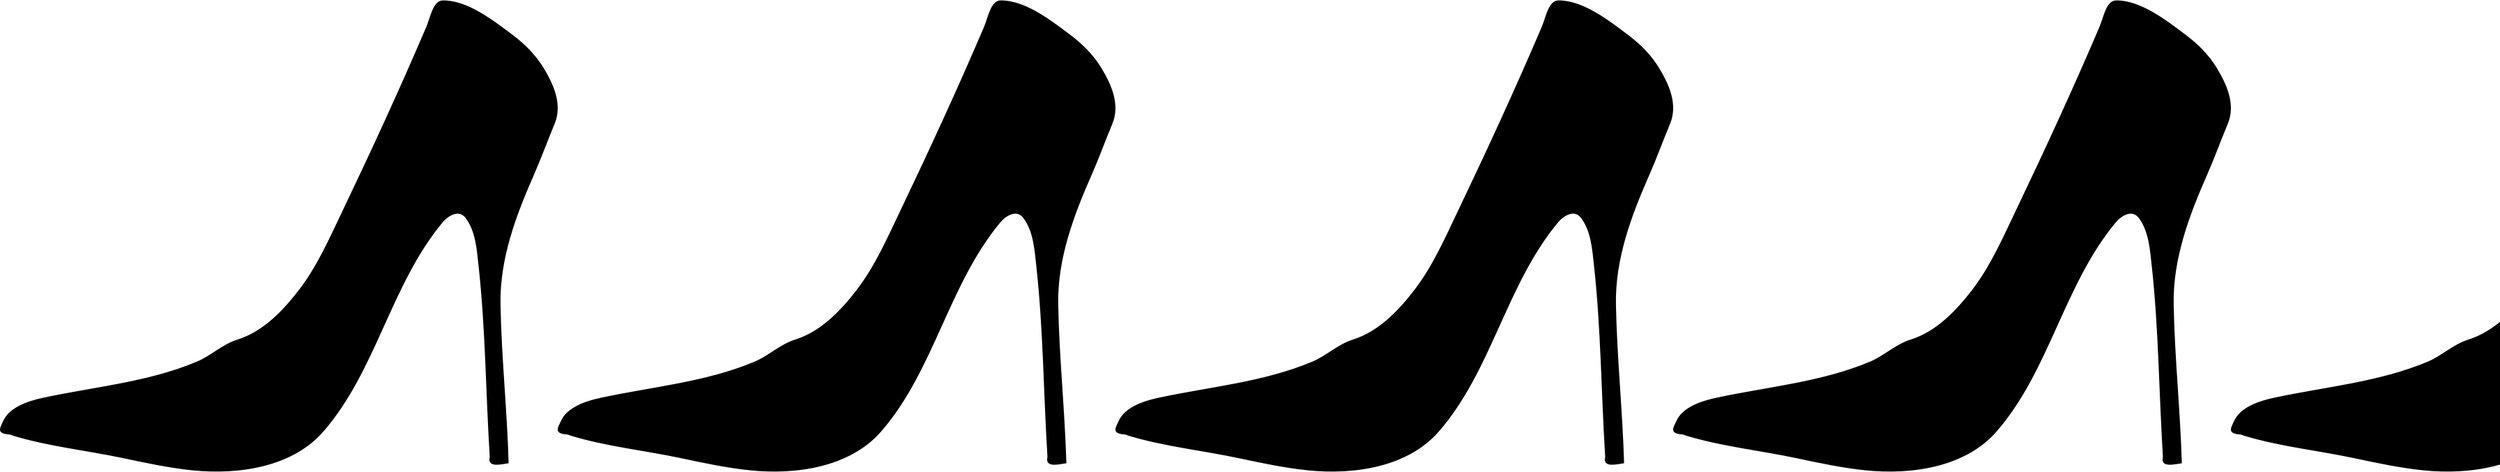 Four_And_A_Half_Heels[1].jpg